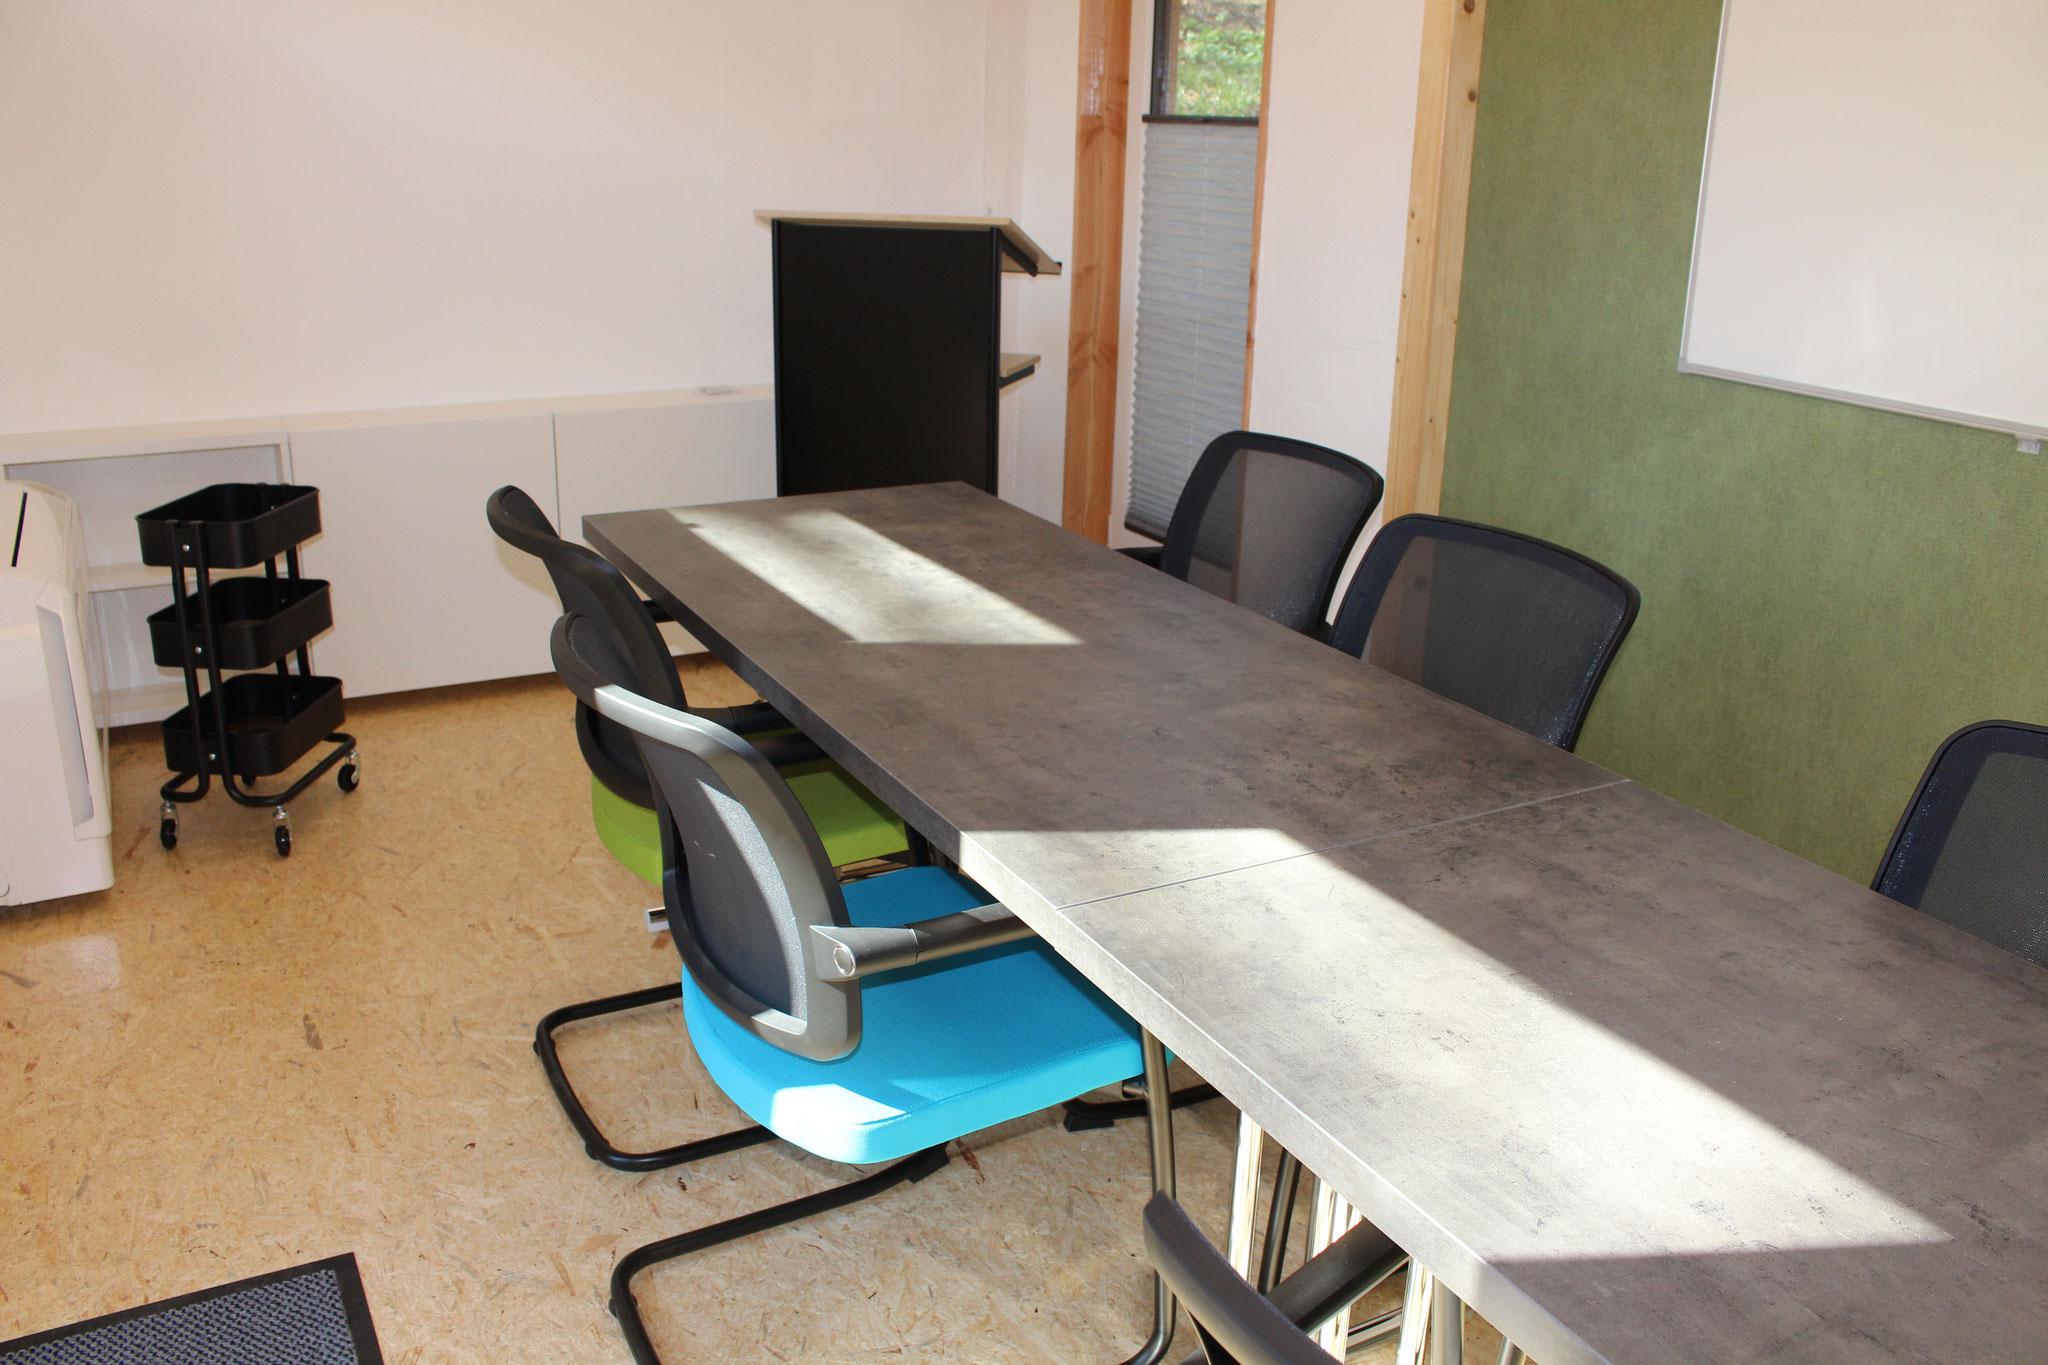 Langer Tisch im mittleren Pavillon